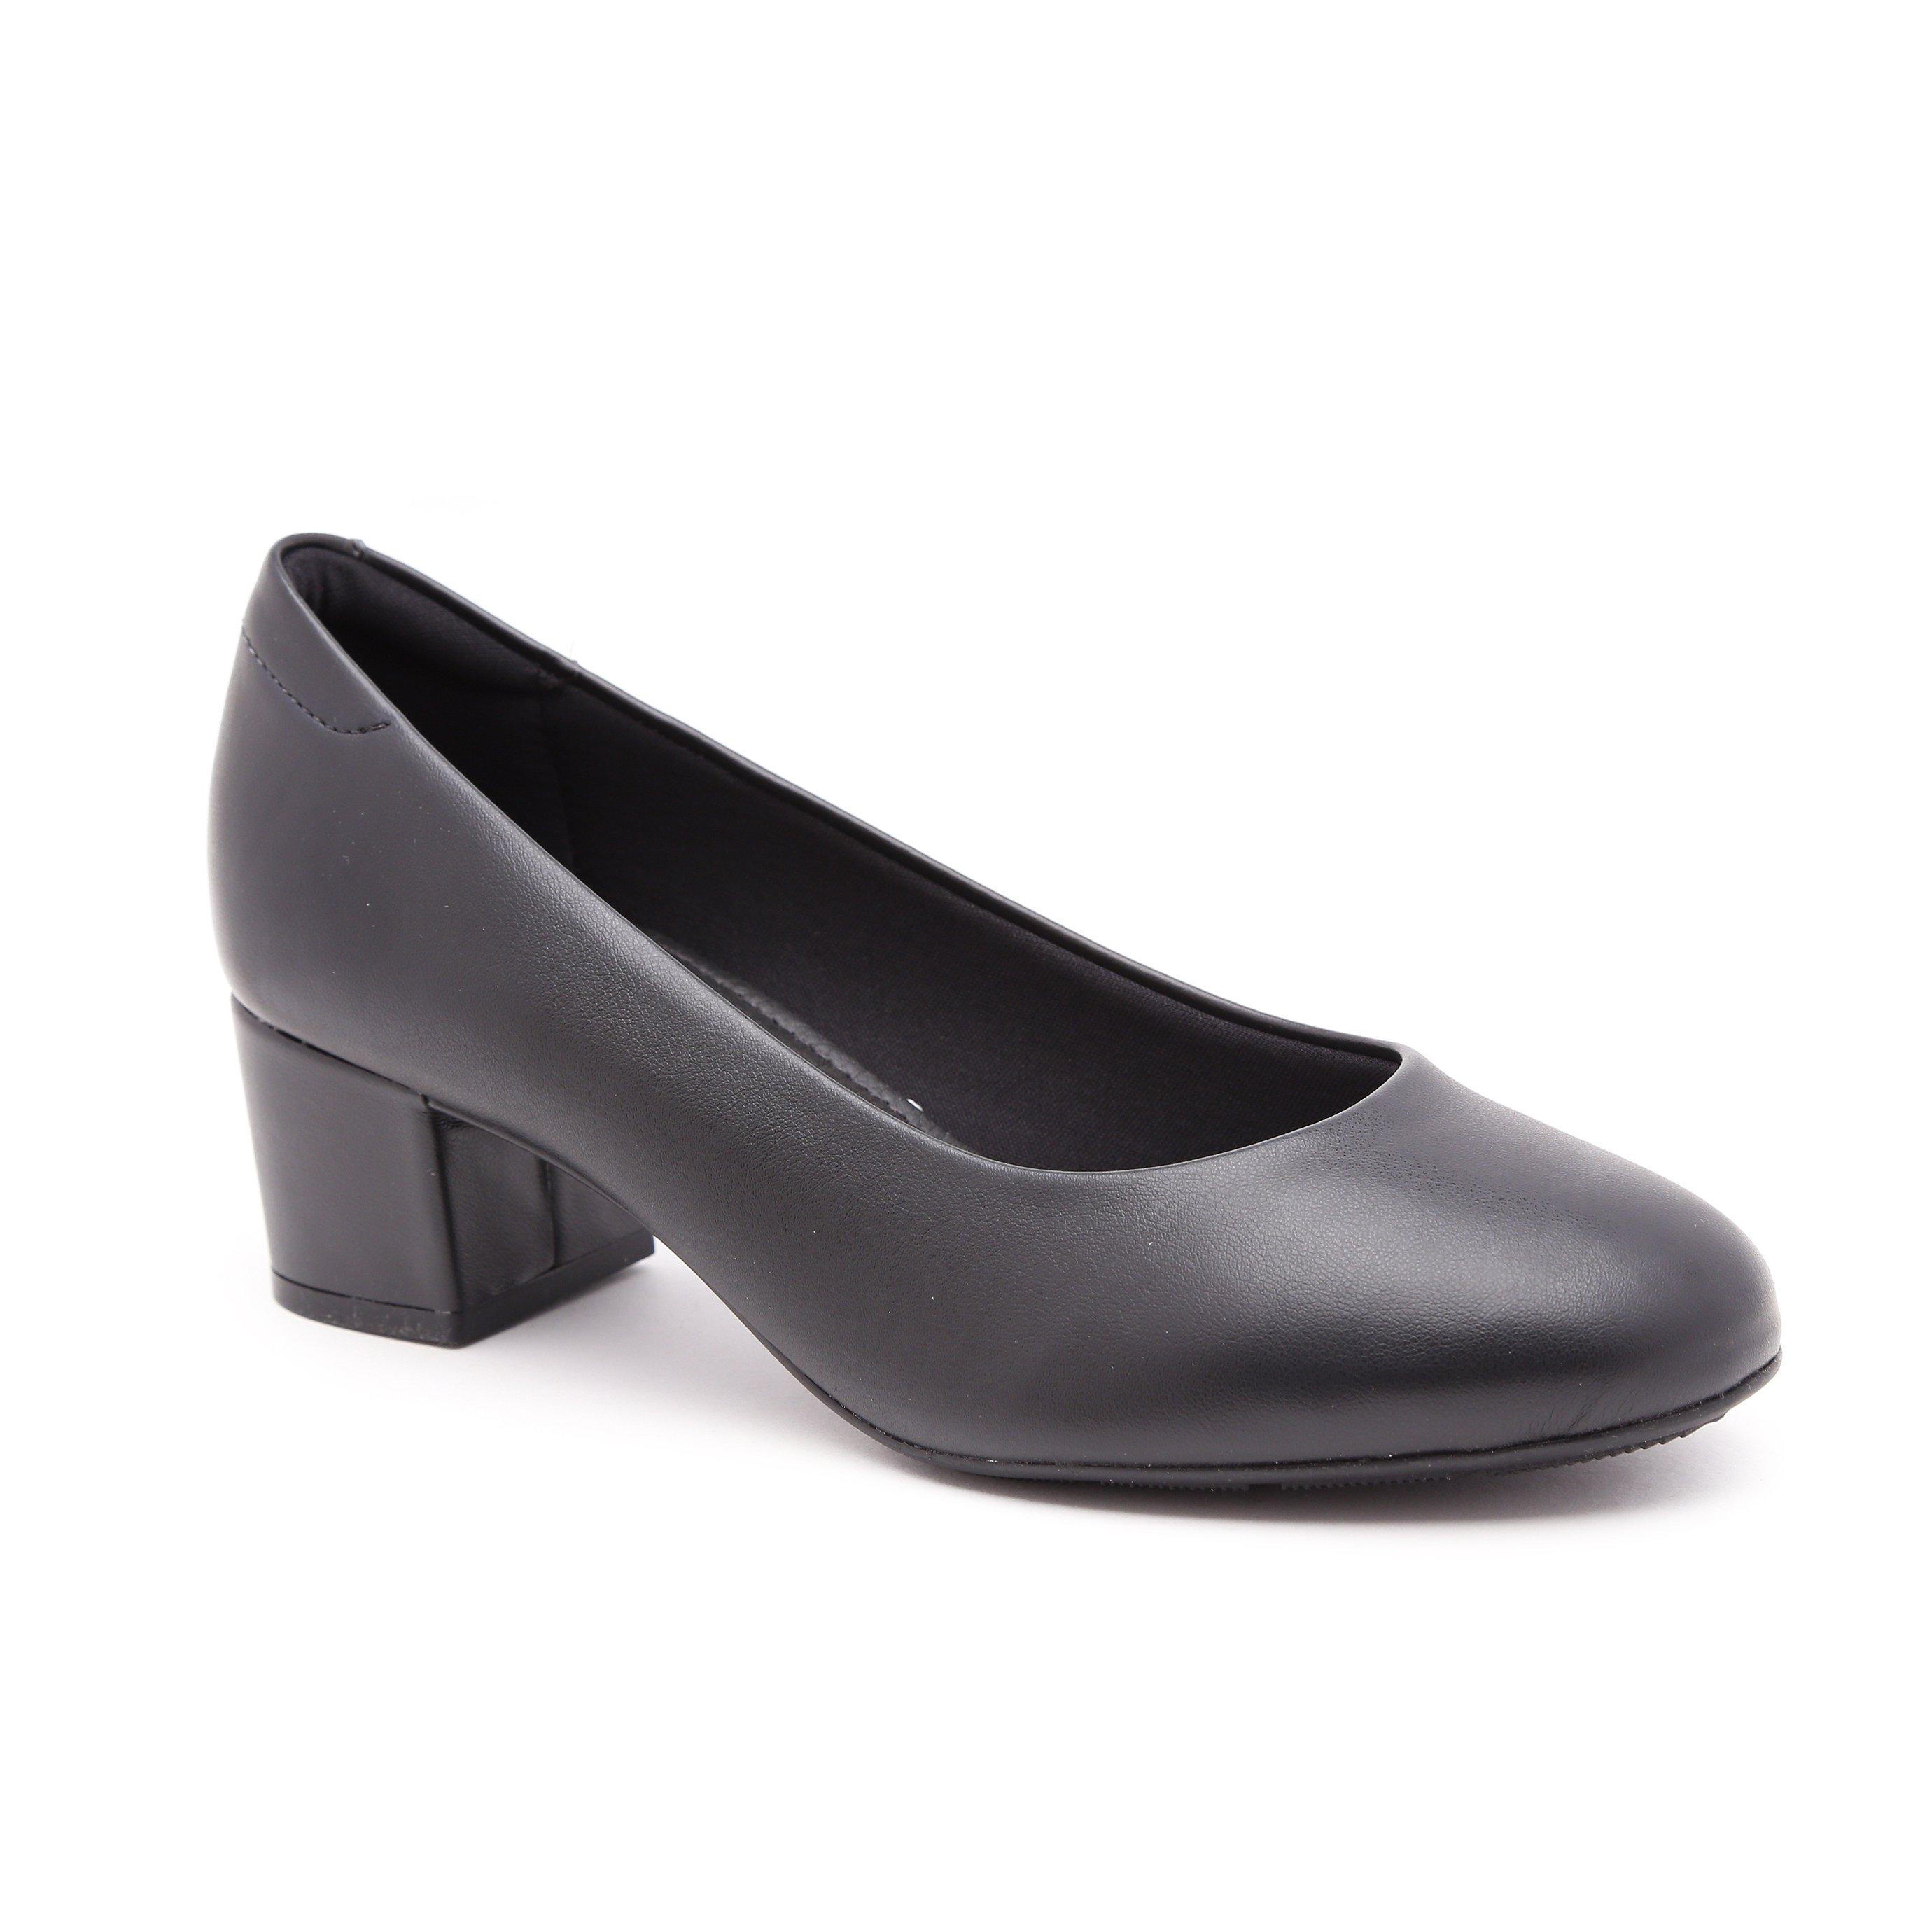 Modare - נעלי עקב נמוך מודארה לנשים בצבע שחור